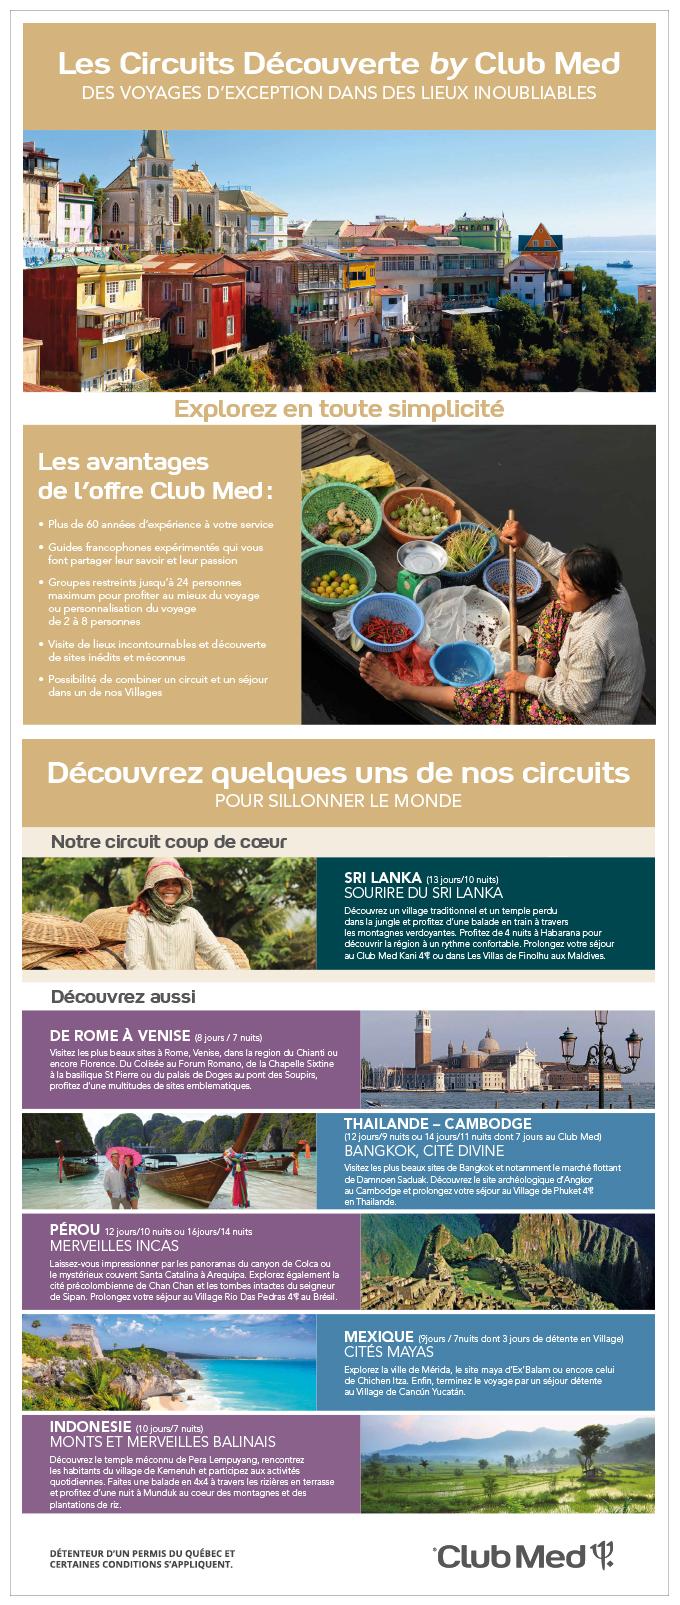 Club Med Circuits découvertes